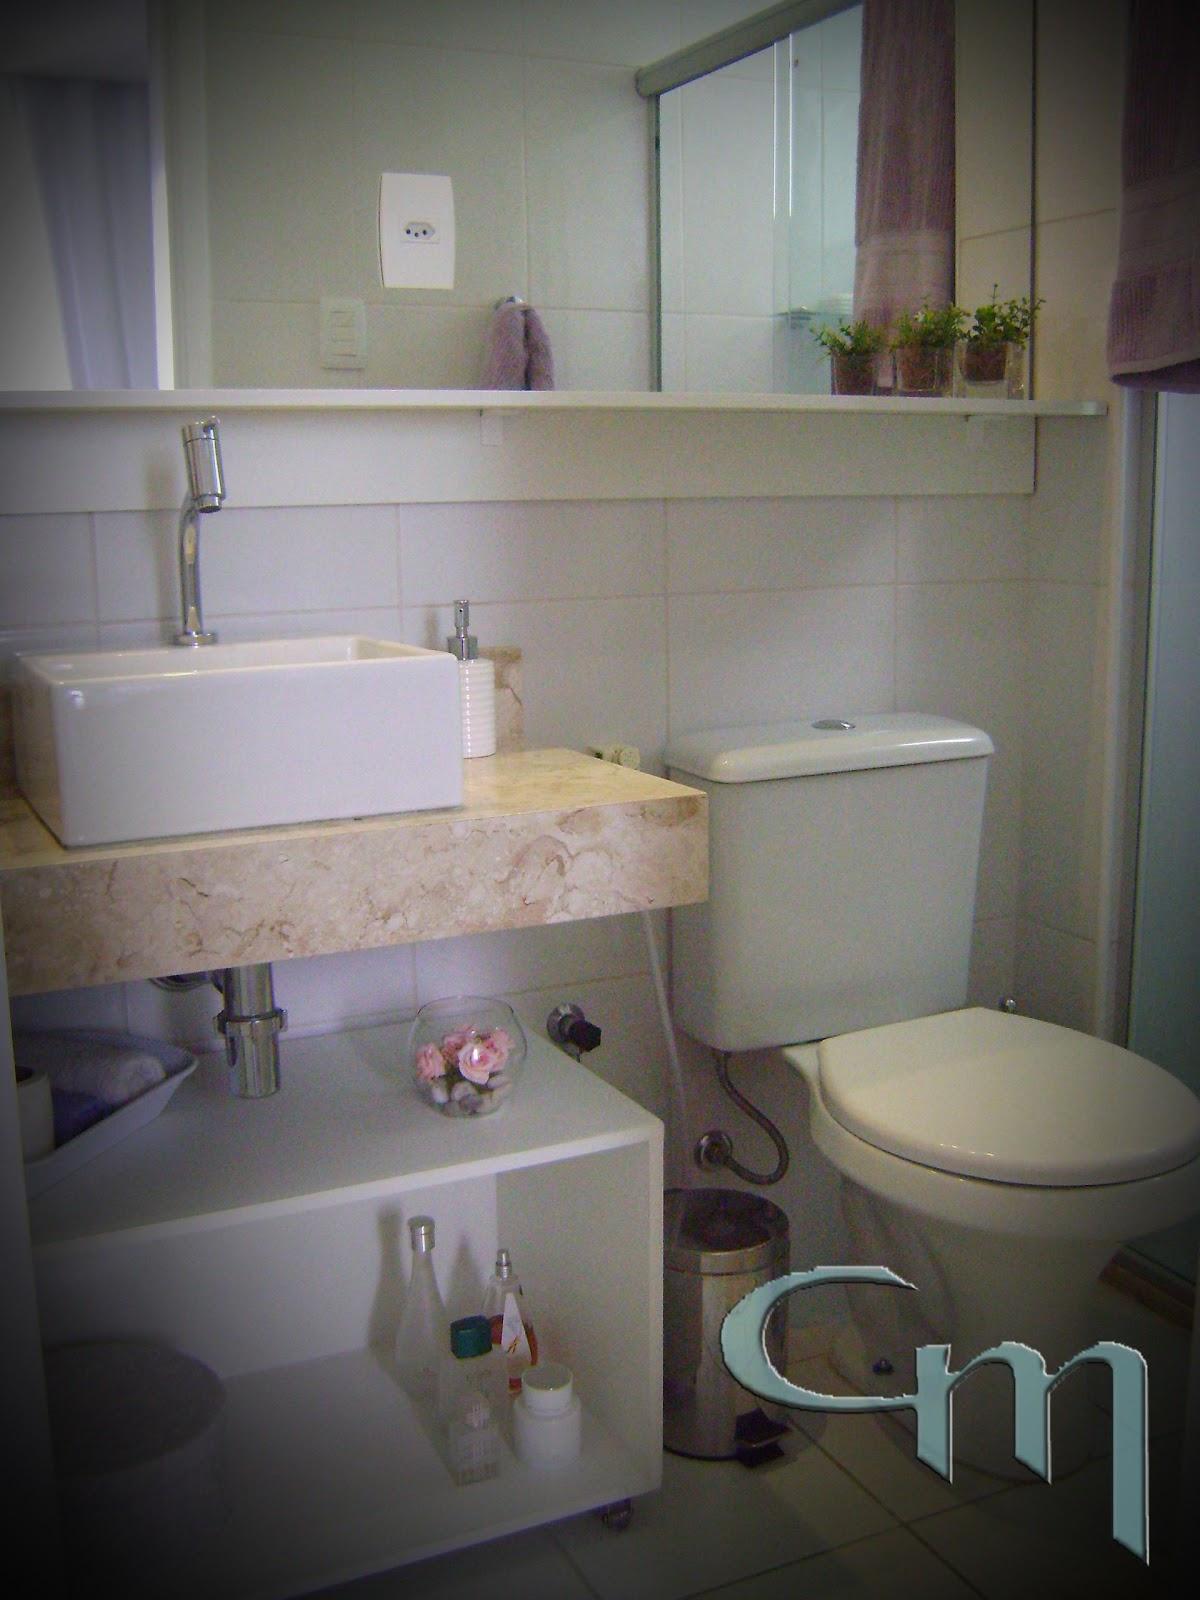 Pensamentos de um Girassol Bege claro, bege médio e bege escuro -> Banheiros Modernos Escuros